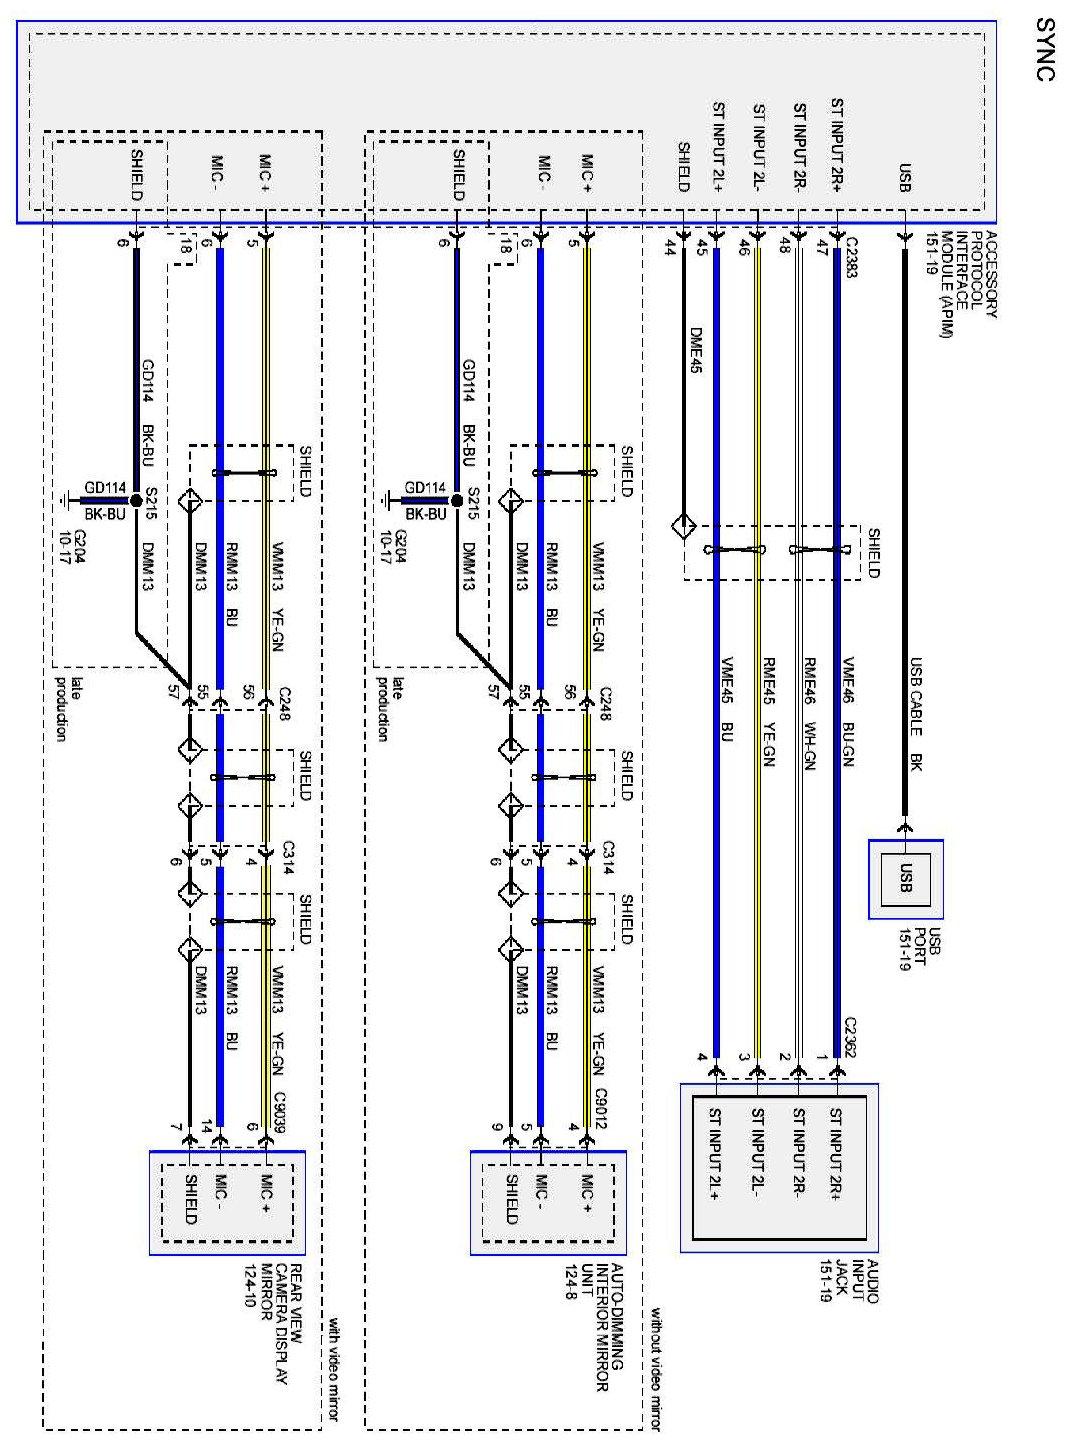 2013 F 150 Radio Wiring Diagram Heater Wiring Diagram 1968 Ford Galaxie Bege Wiring Diagram